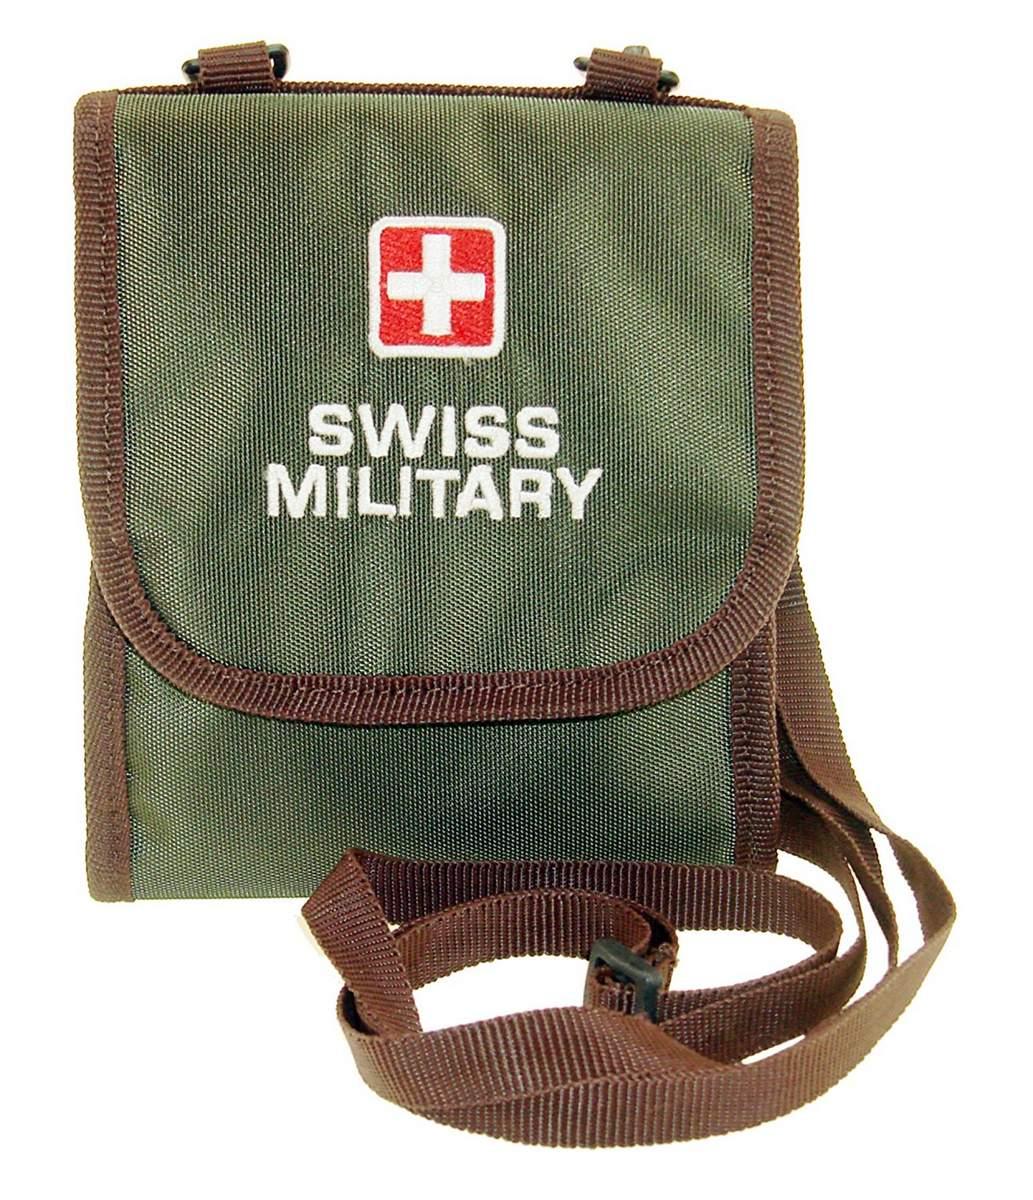 e2573aad027c ... Swiss Military TW3 Travel Wallet - Sunrise Trading Co (Banga new  products 78079 14f44 ...